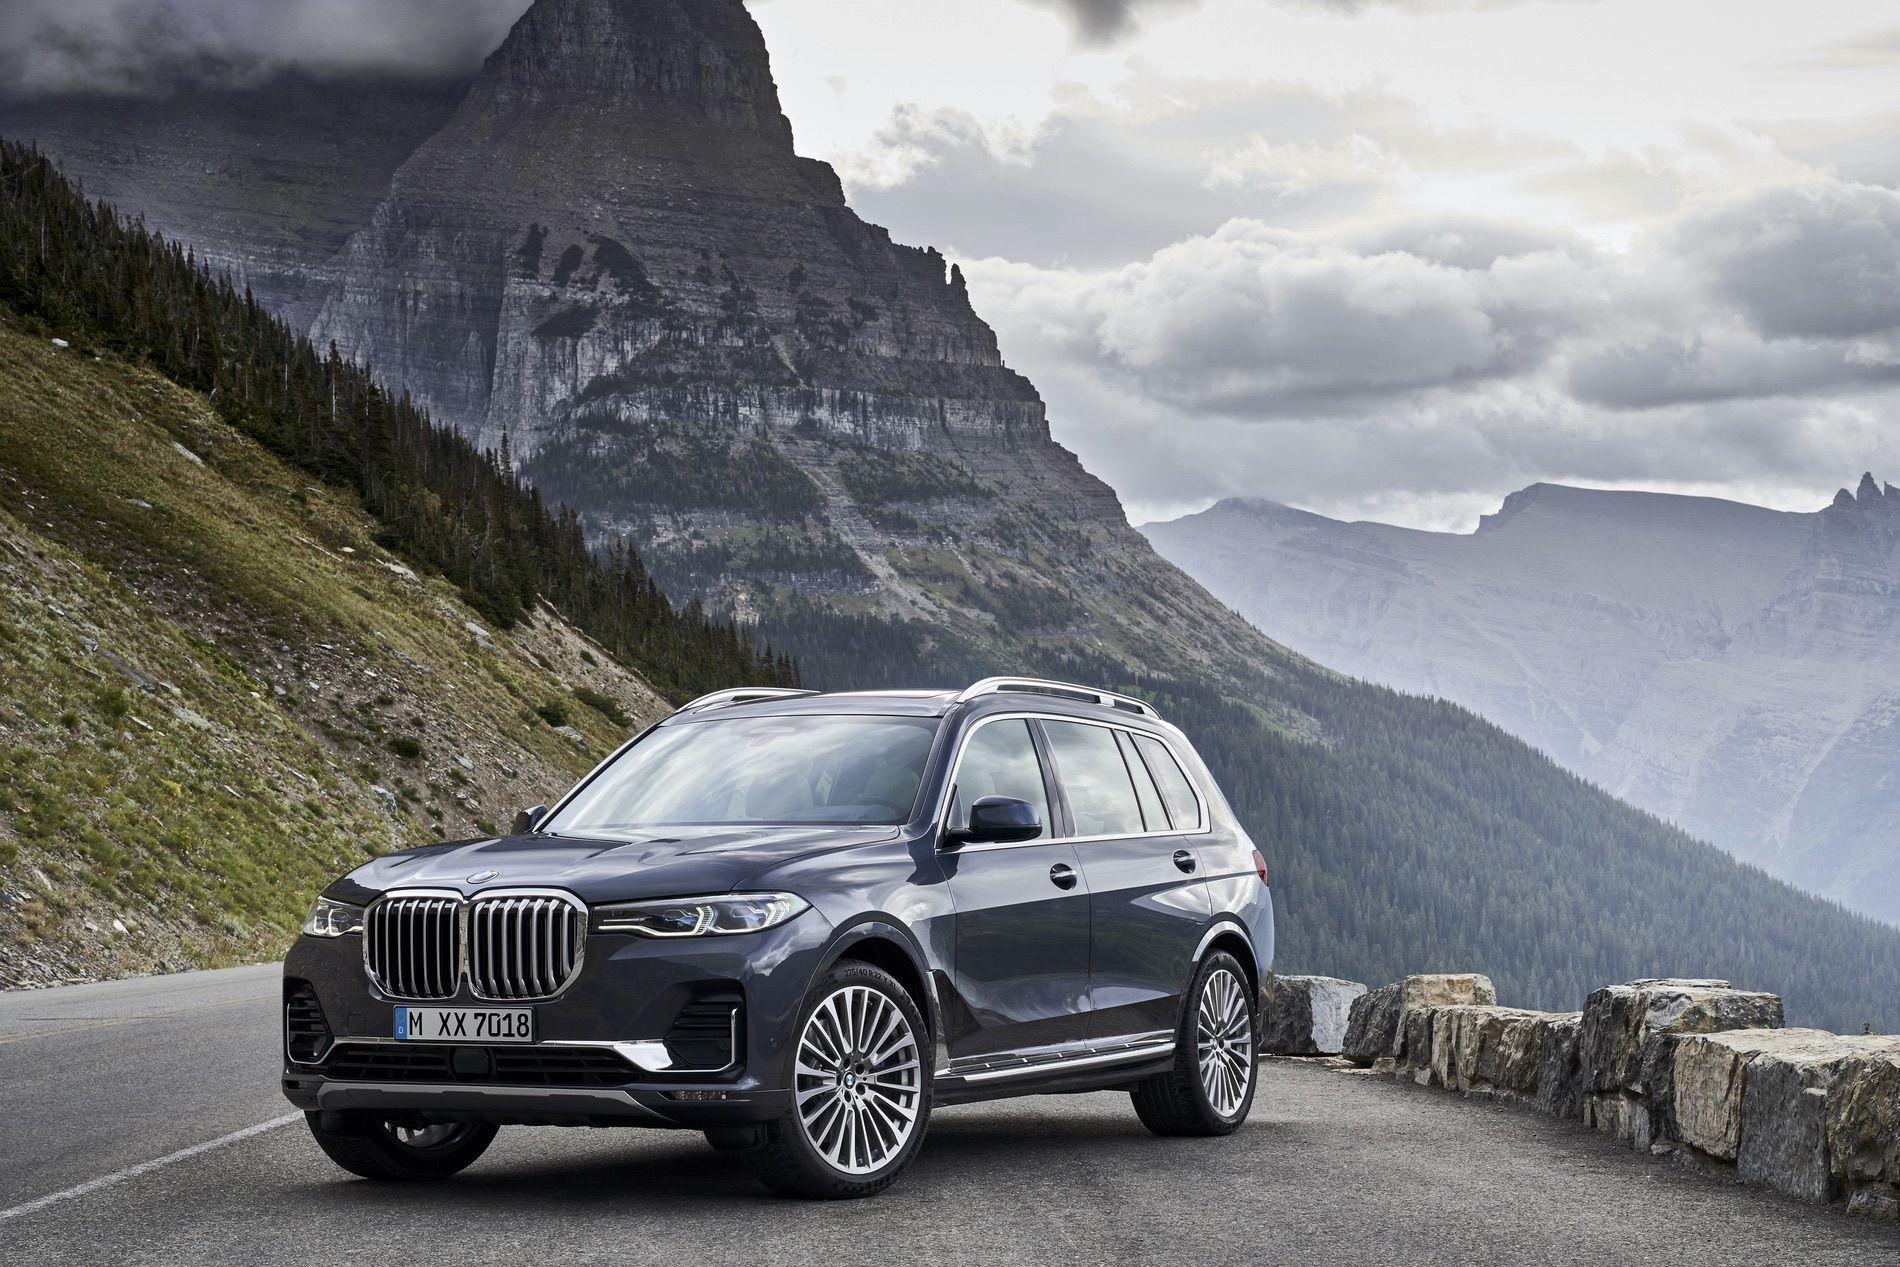 BMW X7 exterior 22